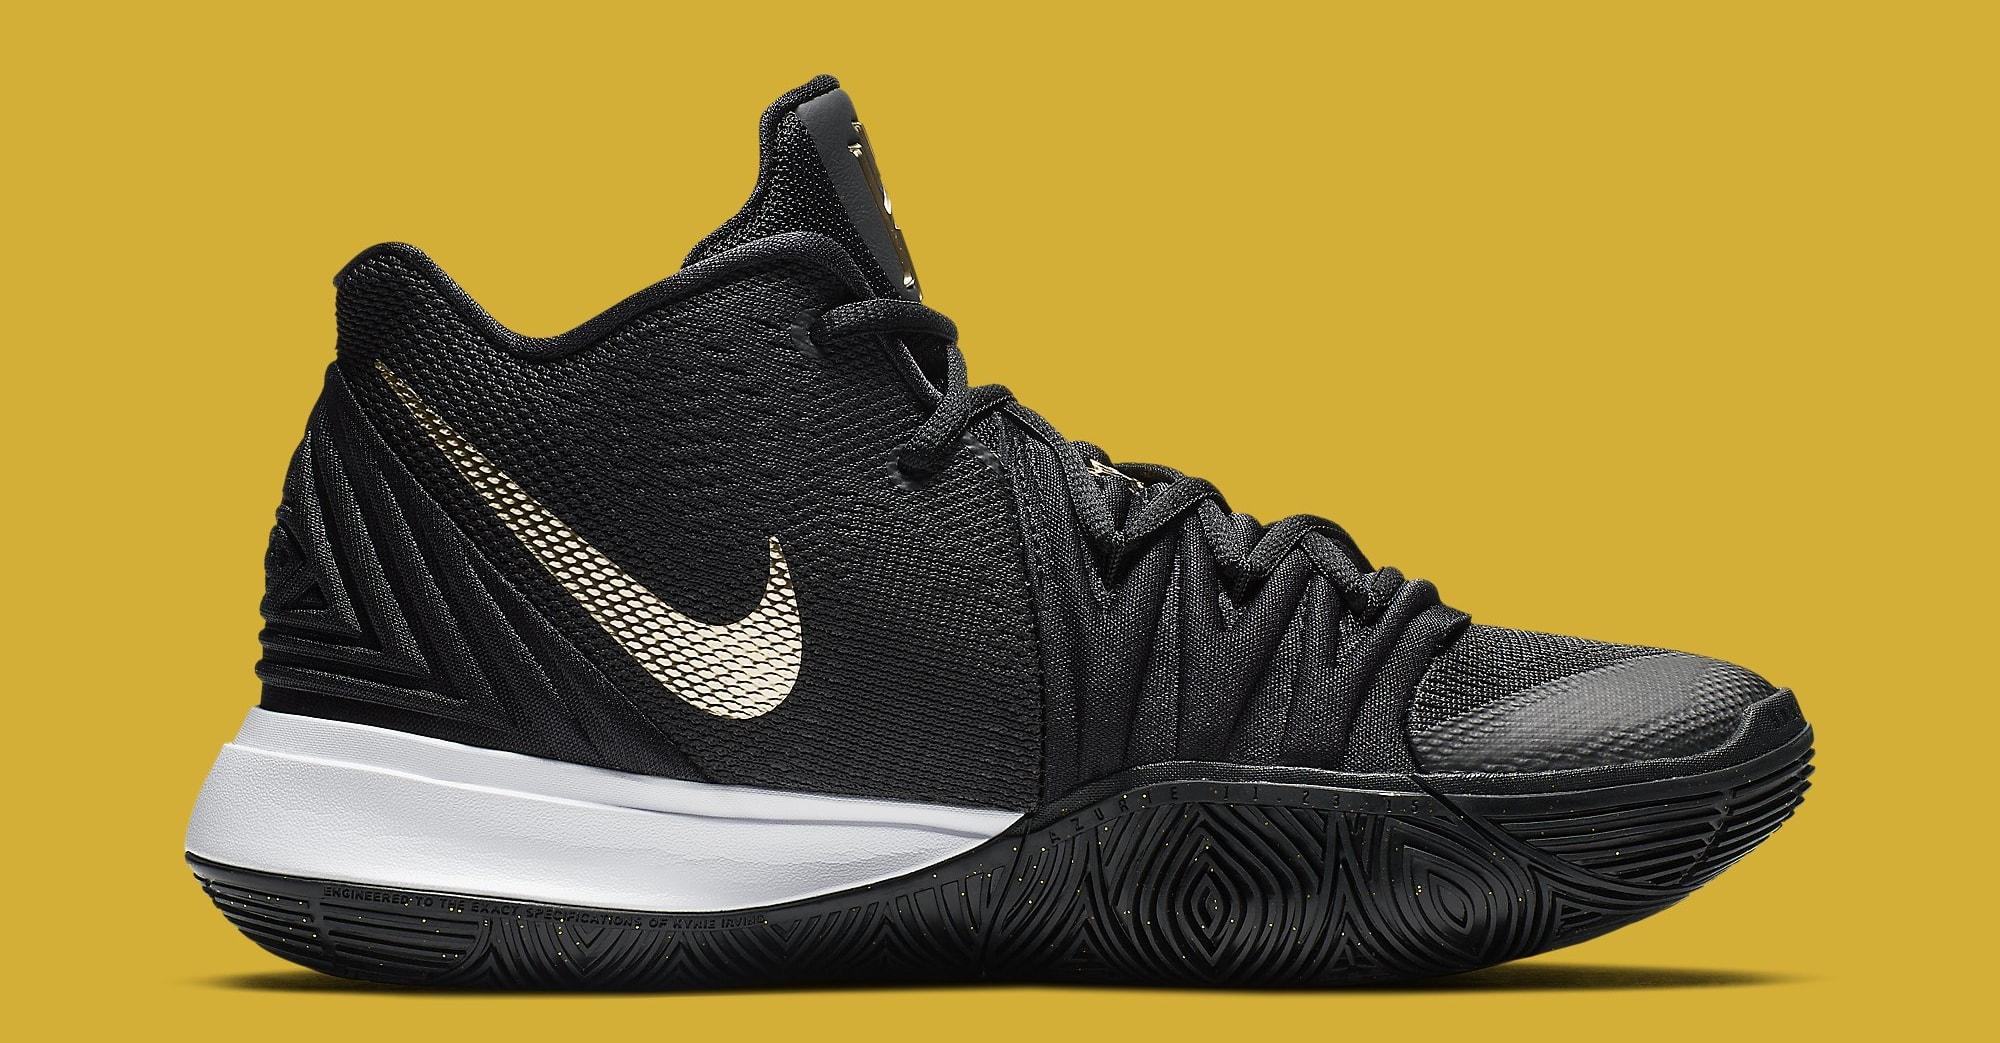 Nike Kyrie 5 'Black/Gold' AO2918-007 Medial